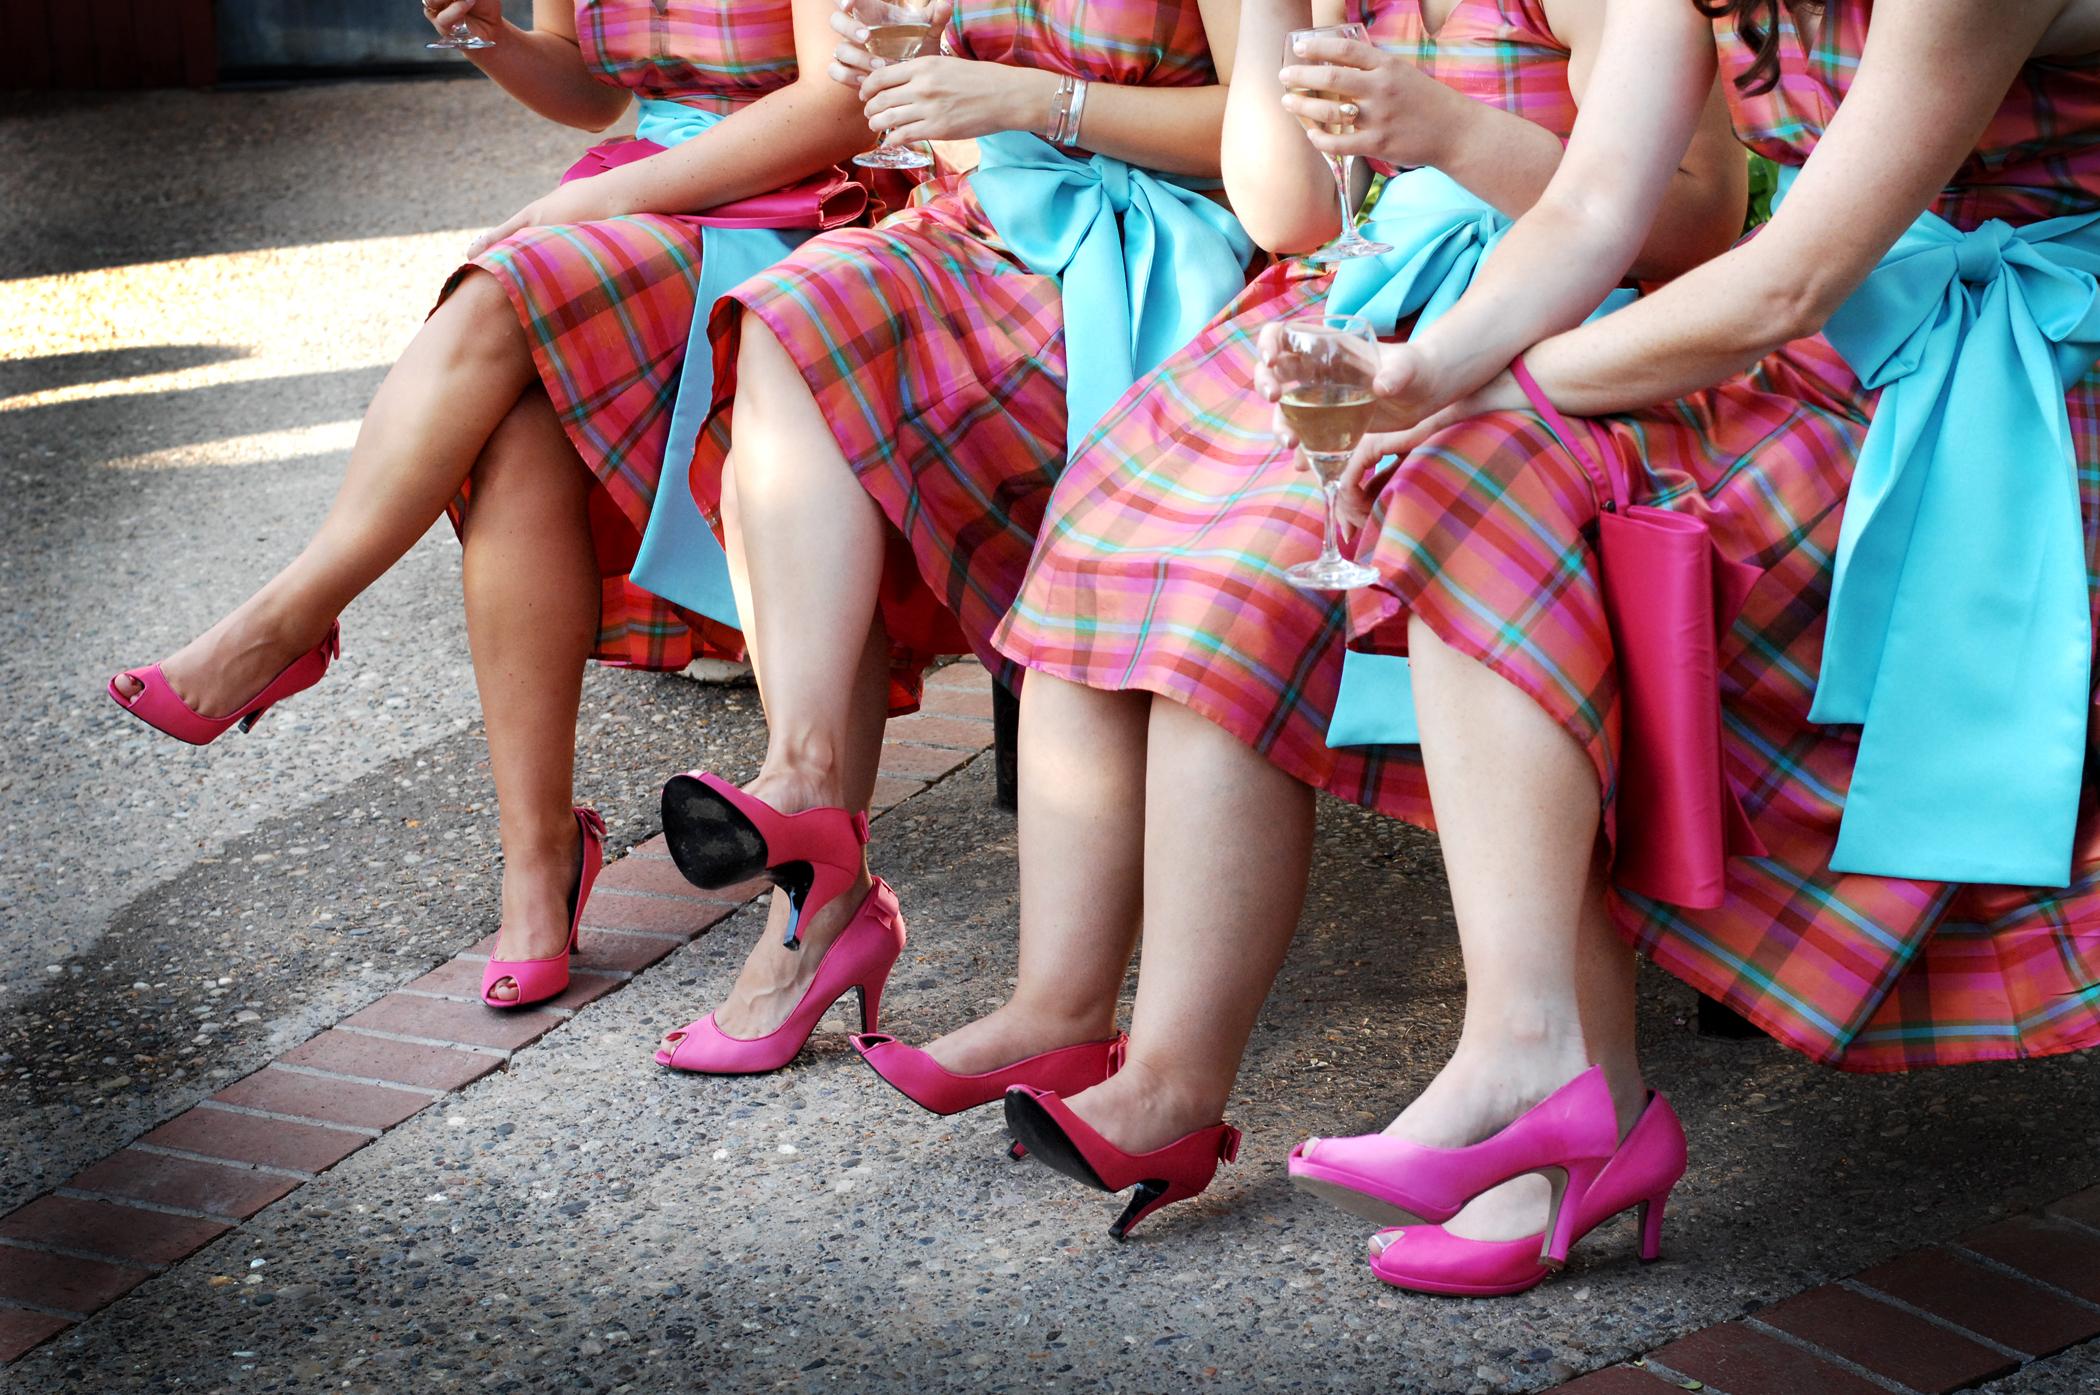 Bridesmaids, Bridesmaids Dresses, Shoes, Fashion, white, pink, Plaid, Dresses, Wine, Kim donald photography